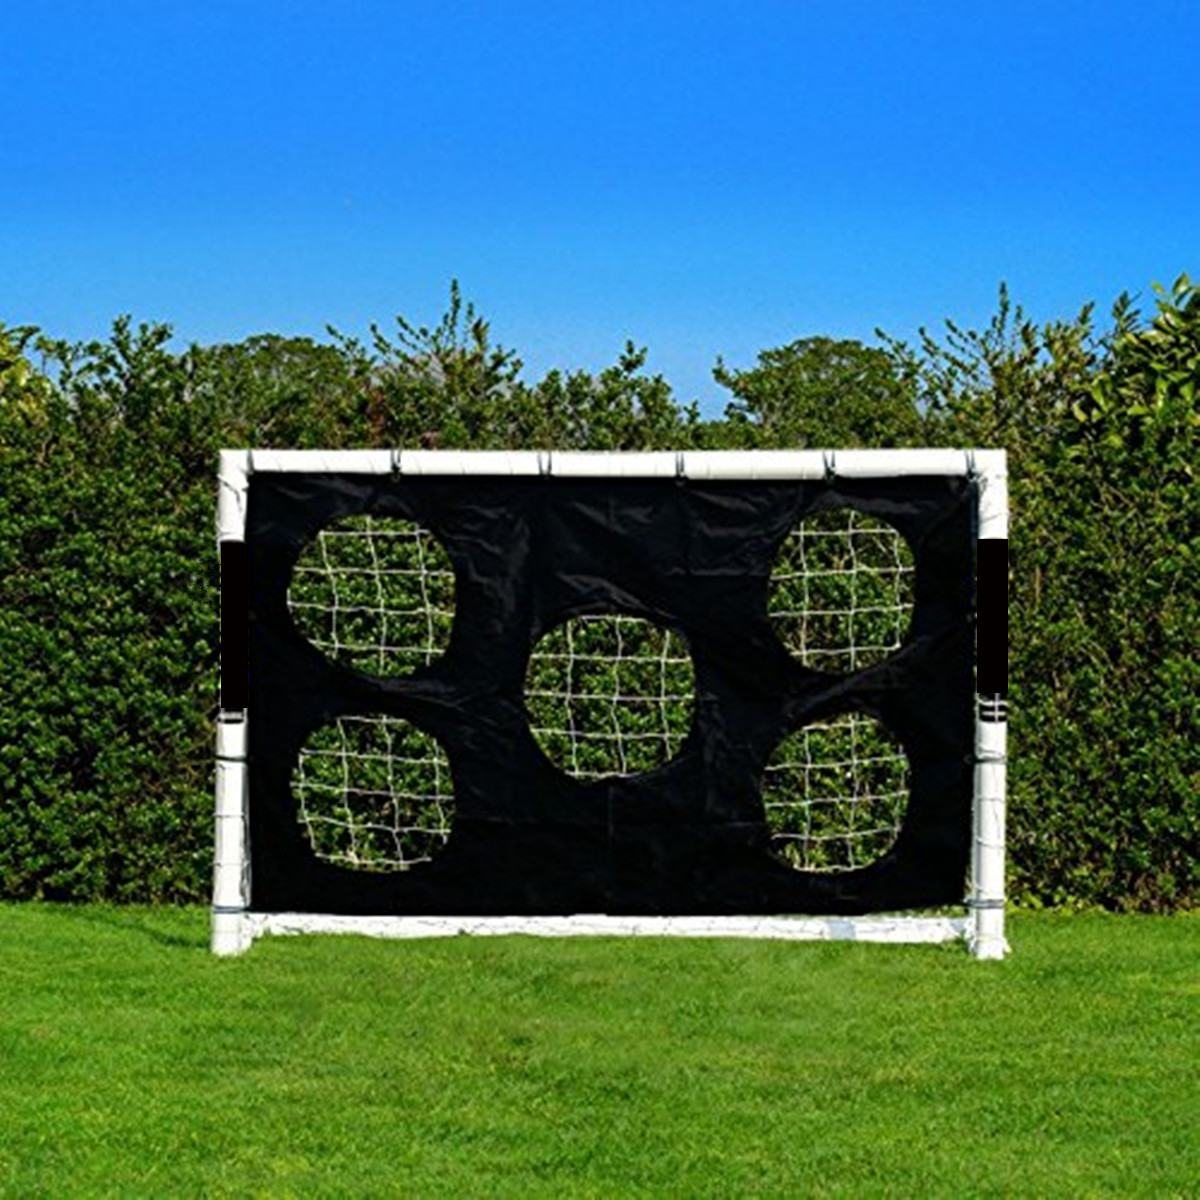 180X120cm Football Training Net Soccer Ball Goal Net Kids Child Birthday Gift Soccer Training Target Indoor Outdoor Sports Gate